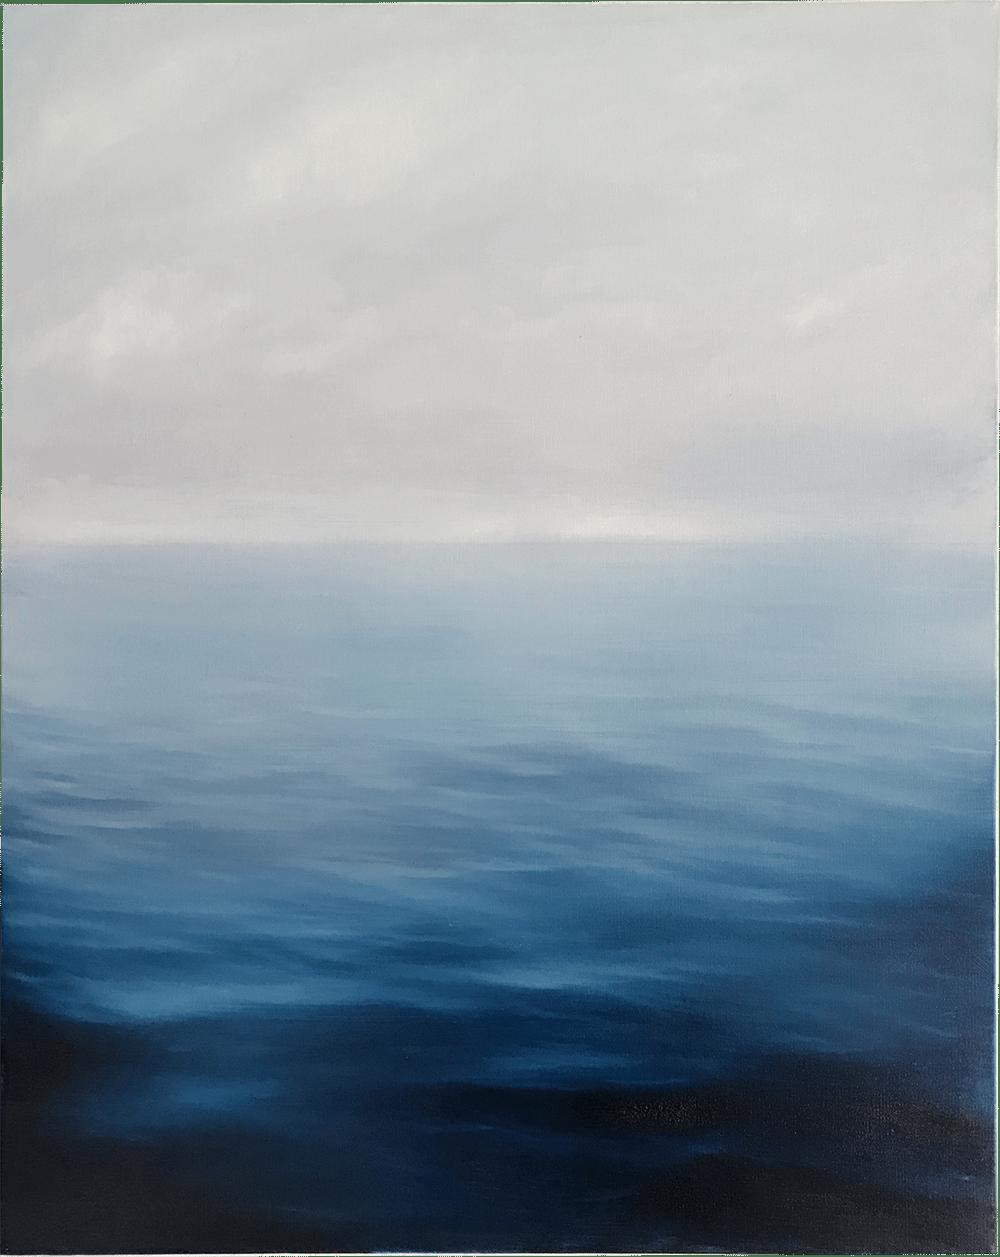 Image of Water No. 9